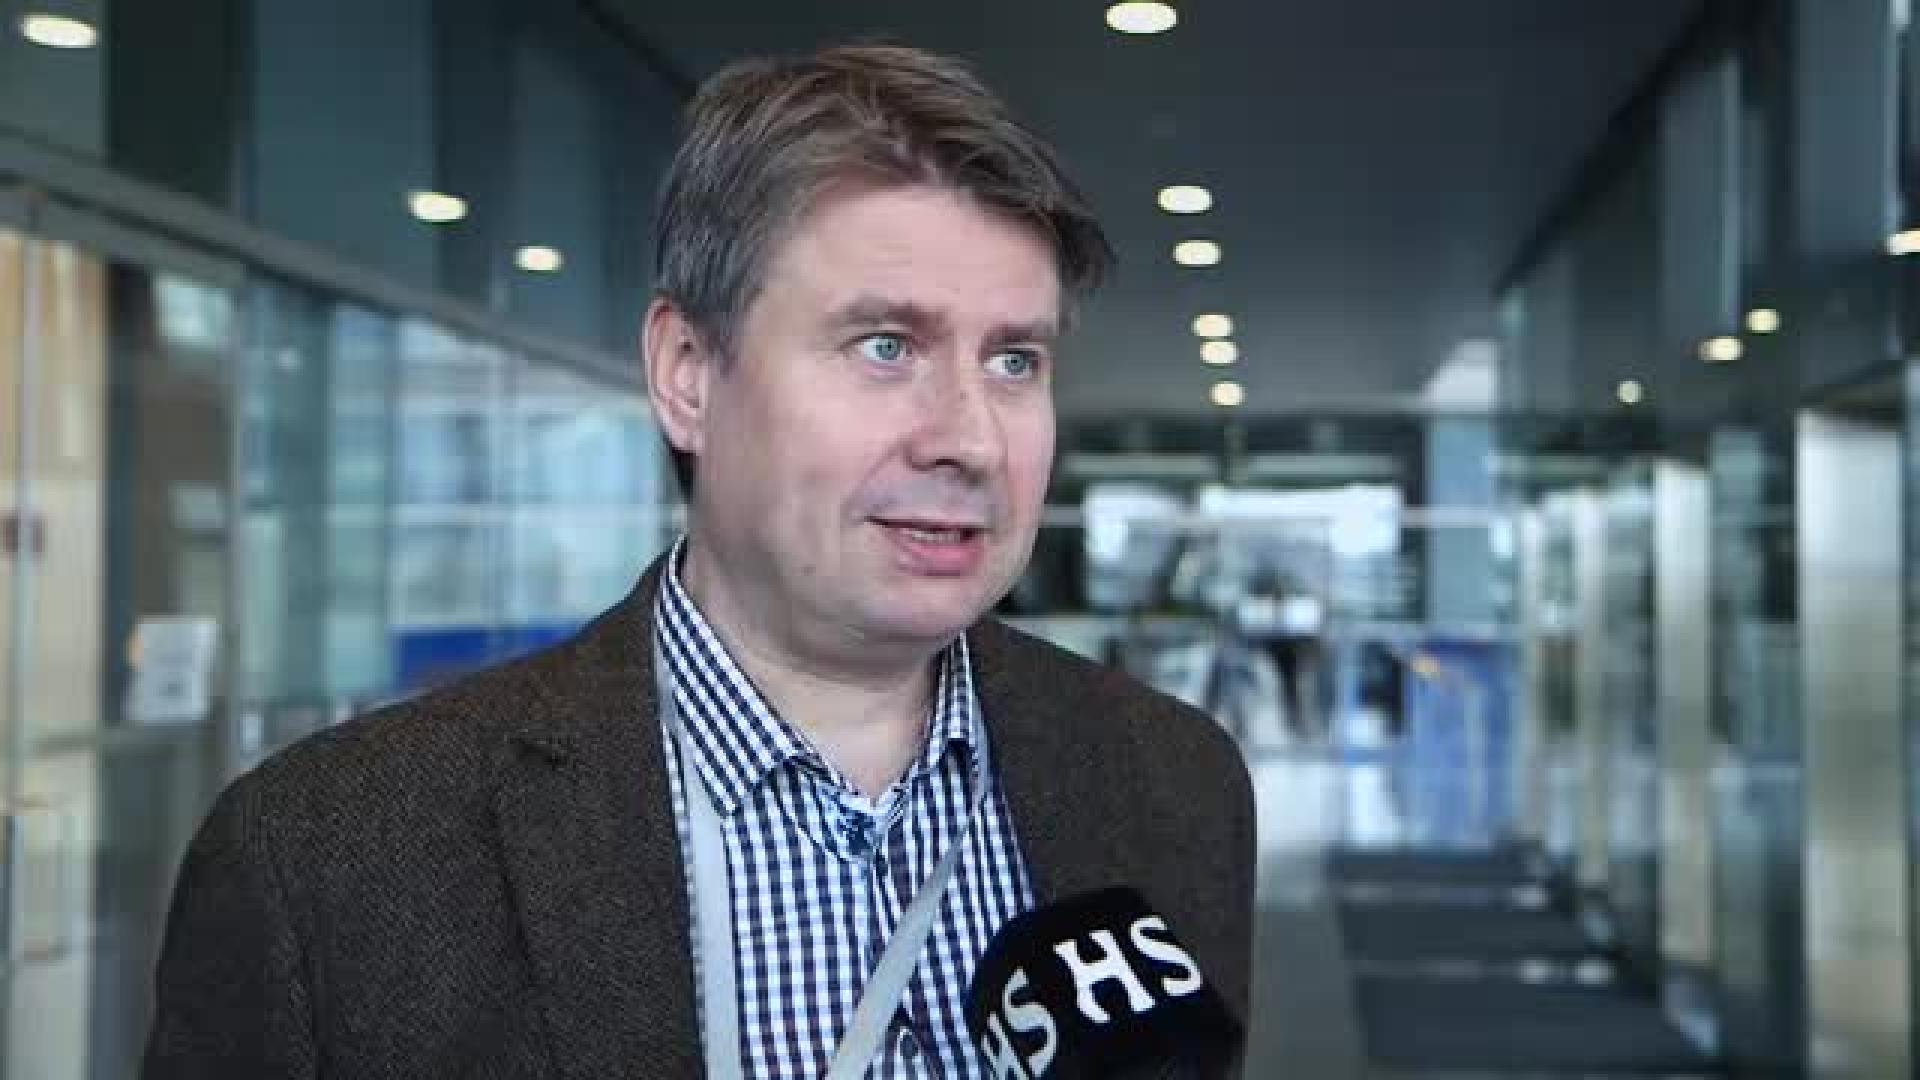 Marko Junkkari